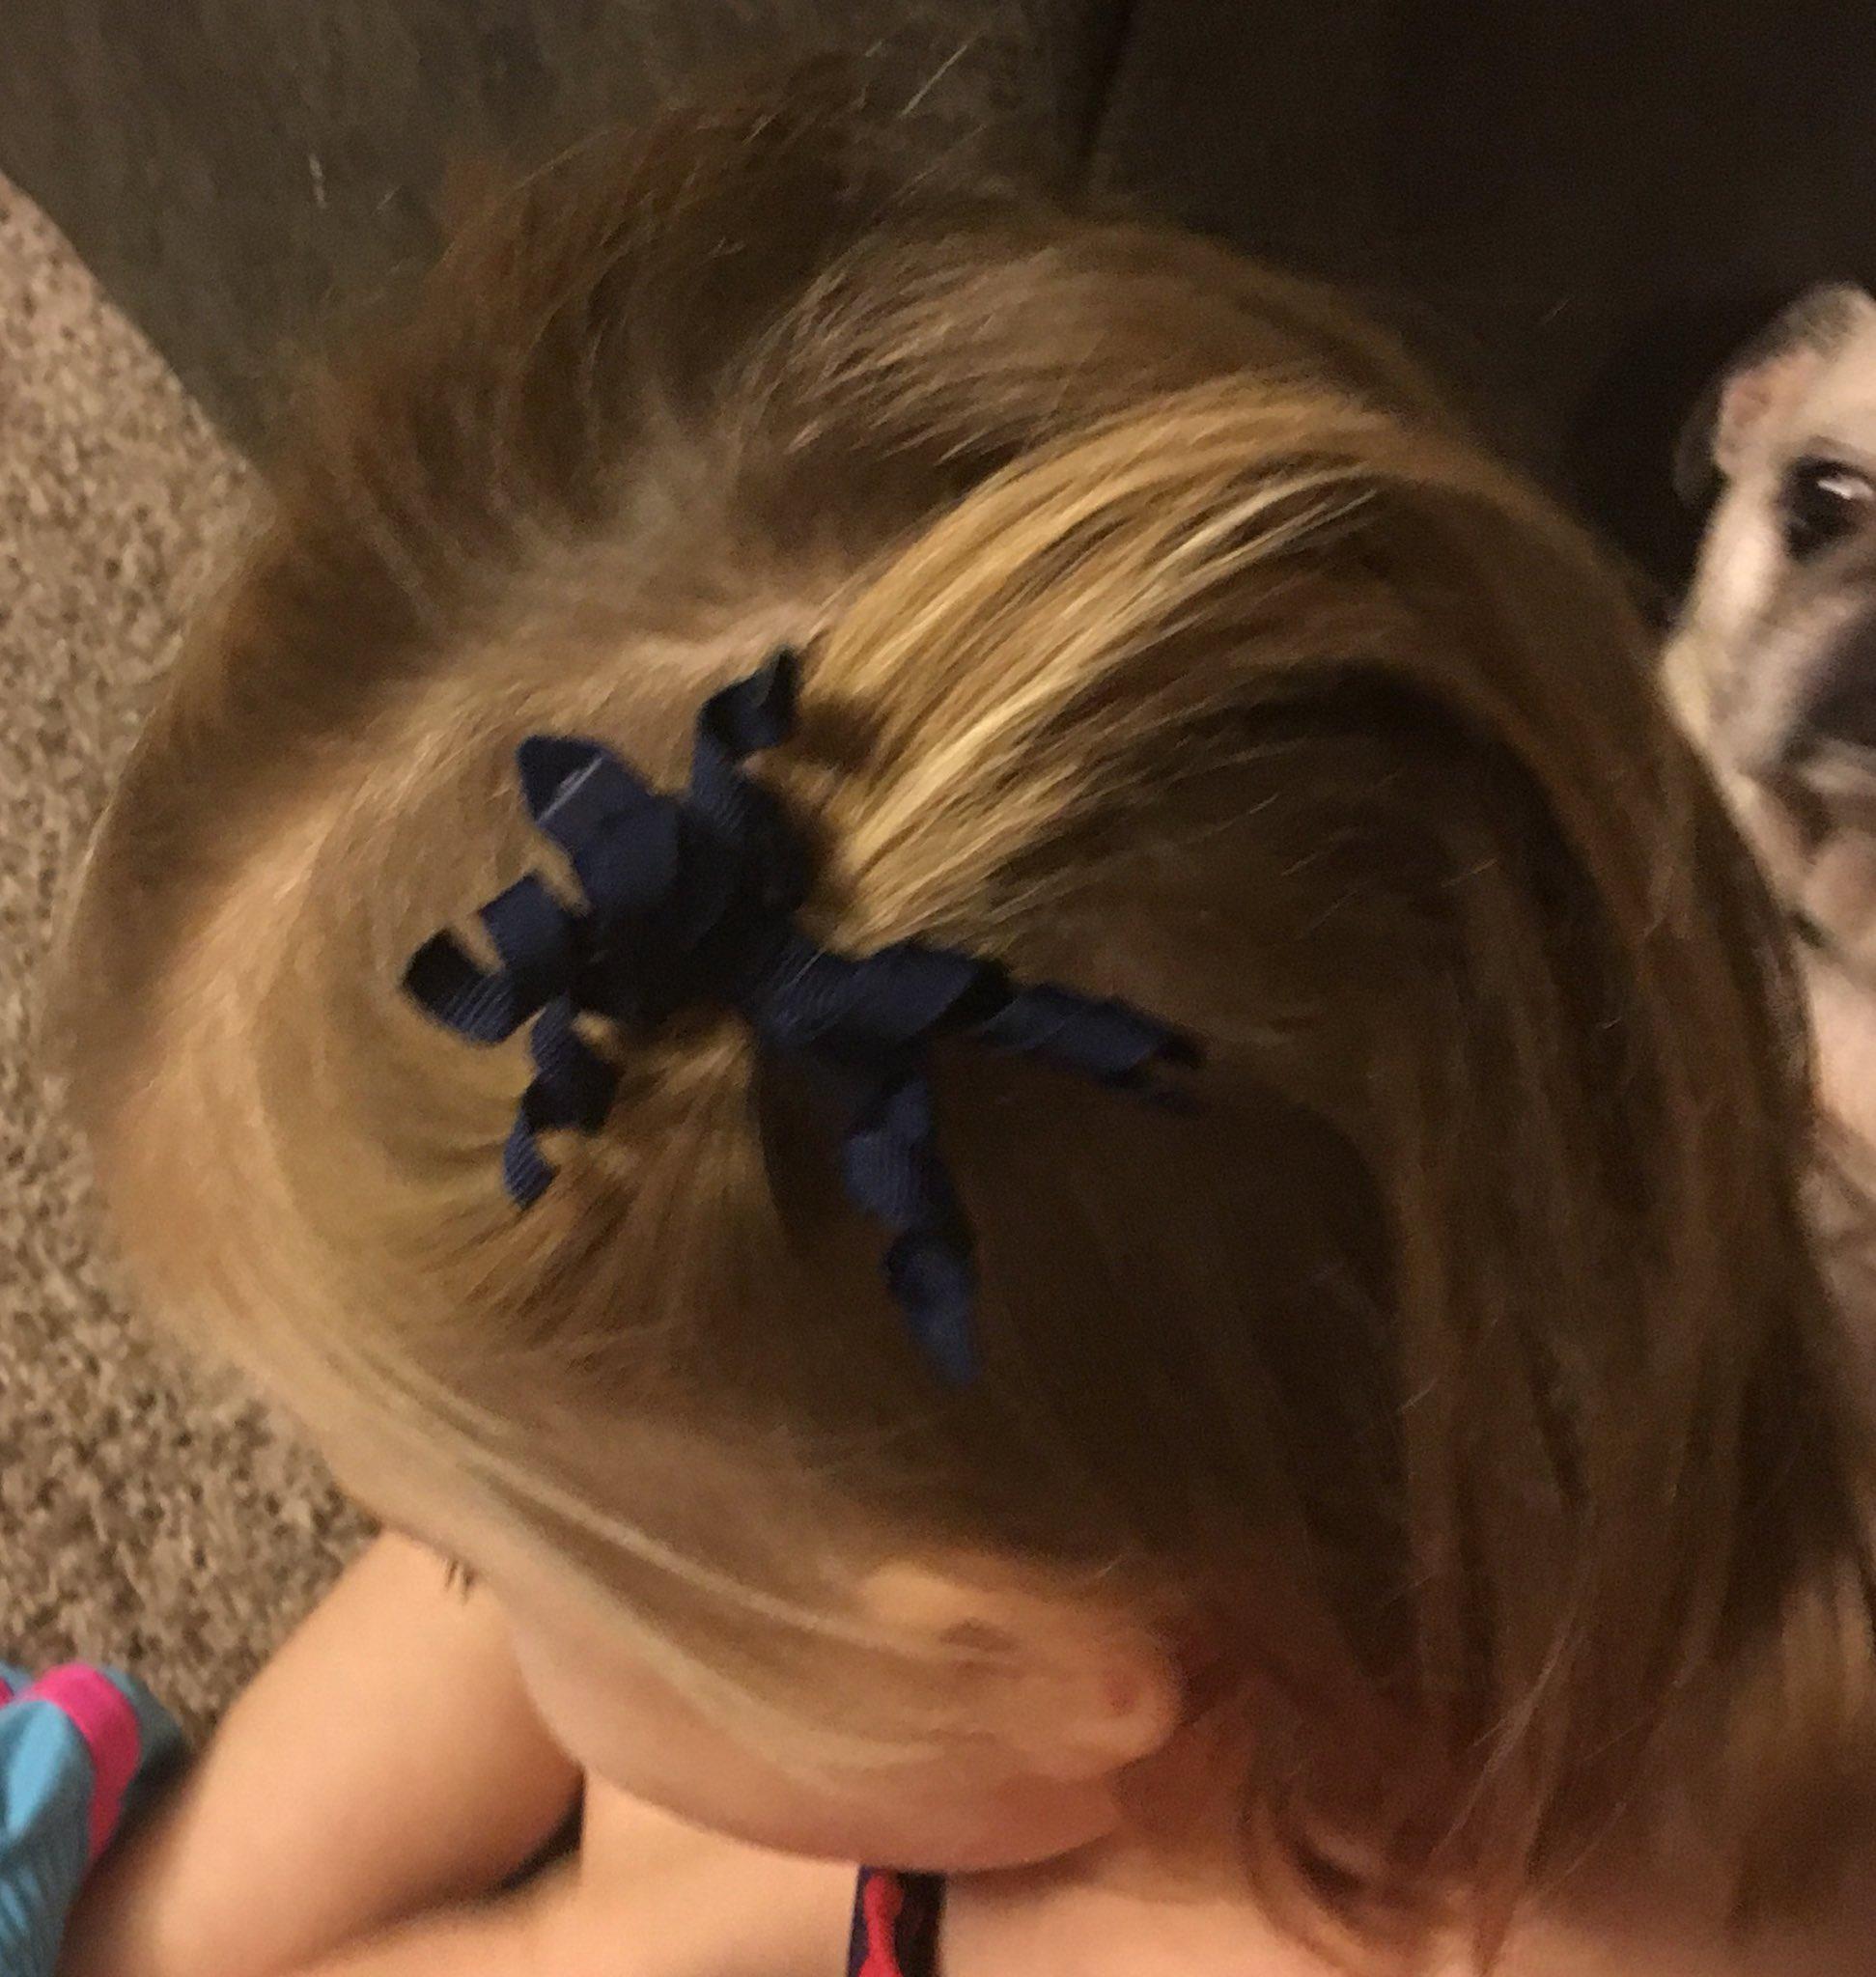 @massp trying creative hairstyles. 😀#masspchat https://t.co/G9u0D3t354